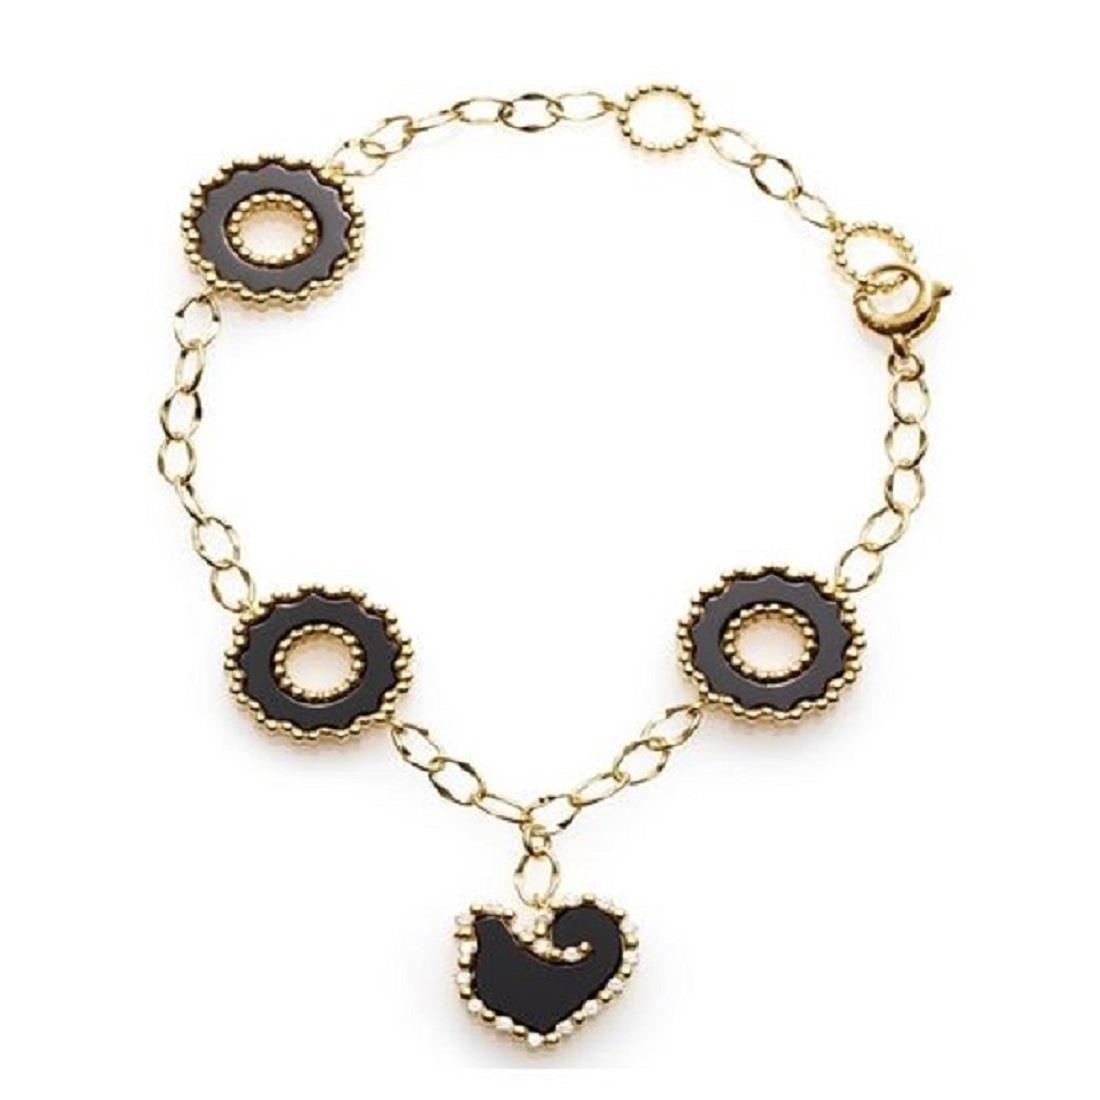 Bracelet with diamonds and onyx - CHANTECLER